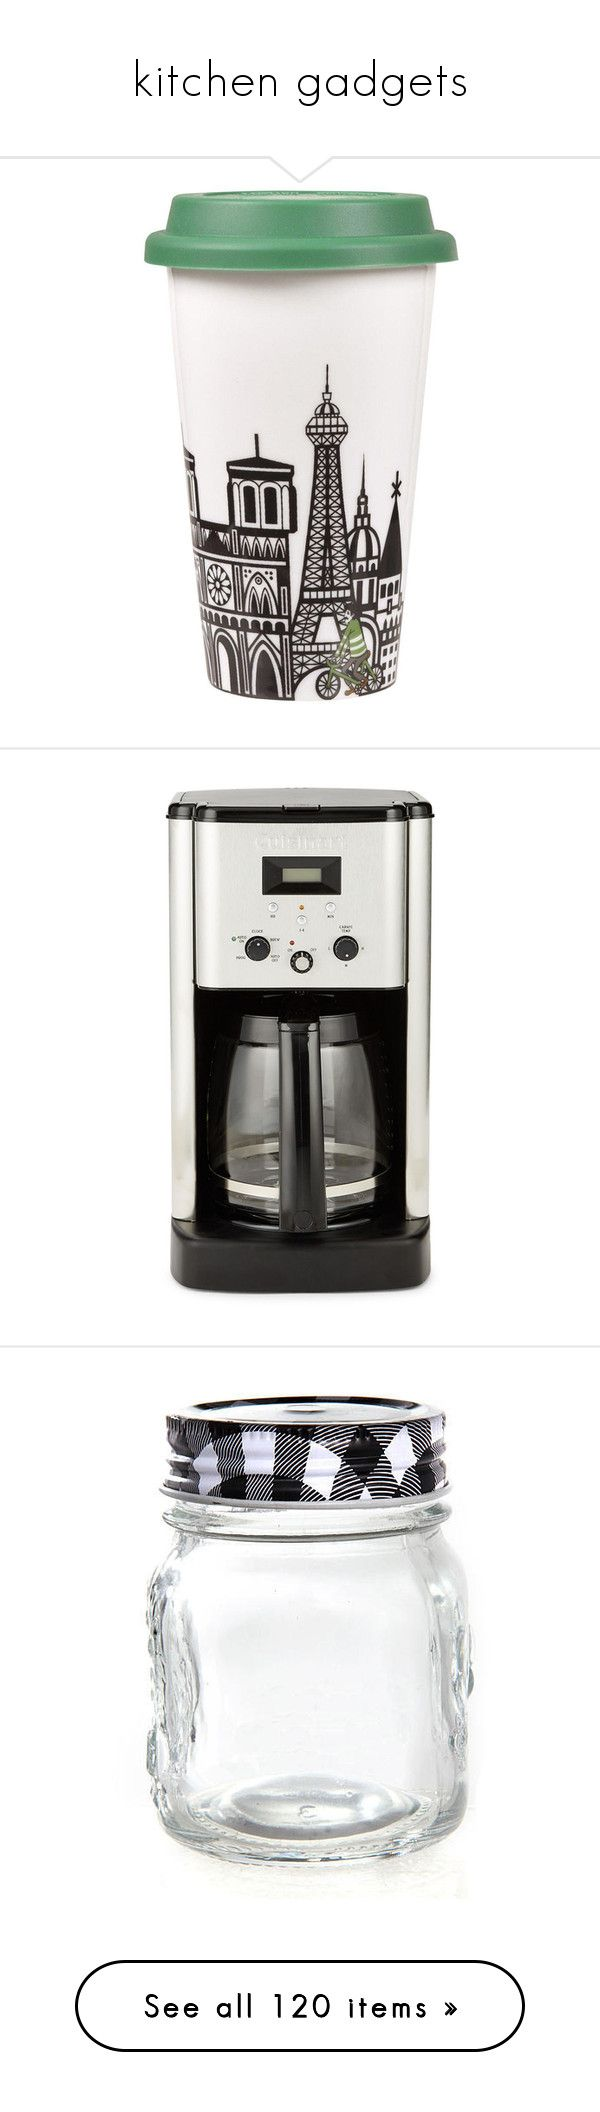 Miniature Dishwasher The 25 Best Small Dishwasher Ideas On Pinterest Portable